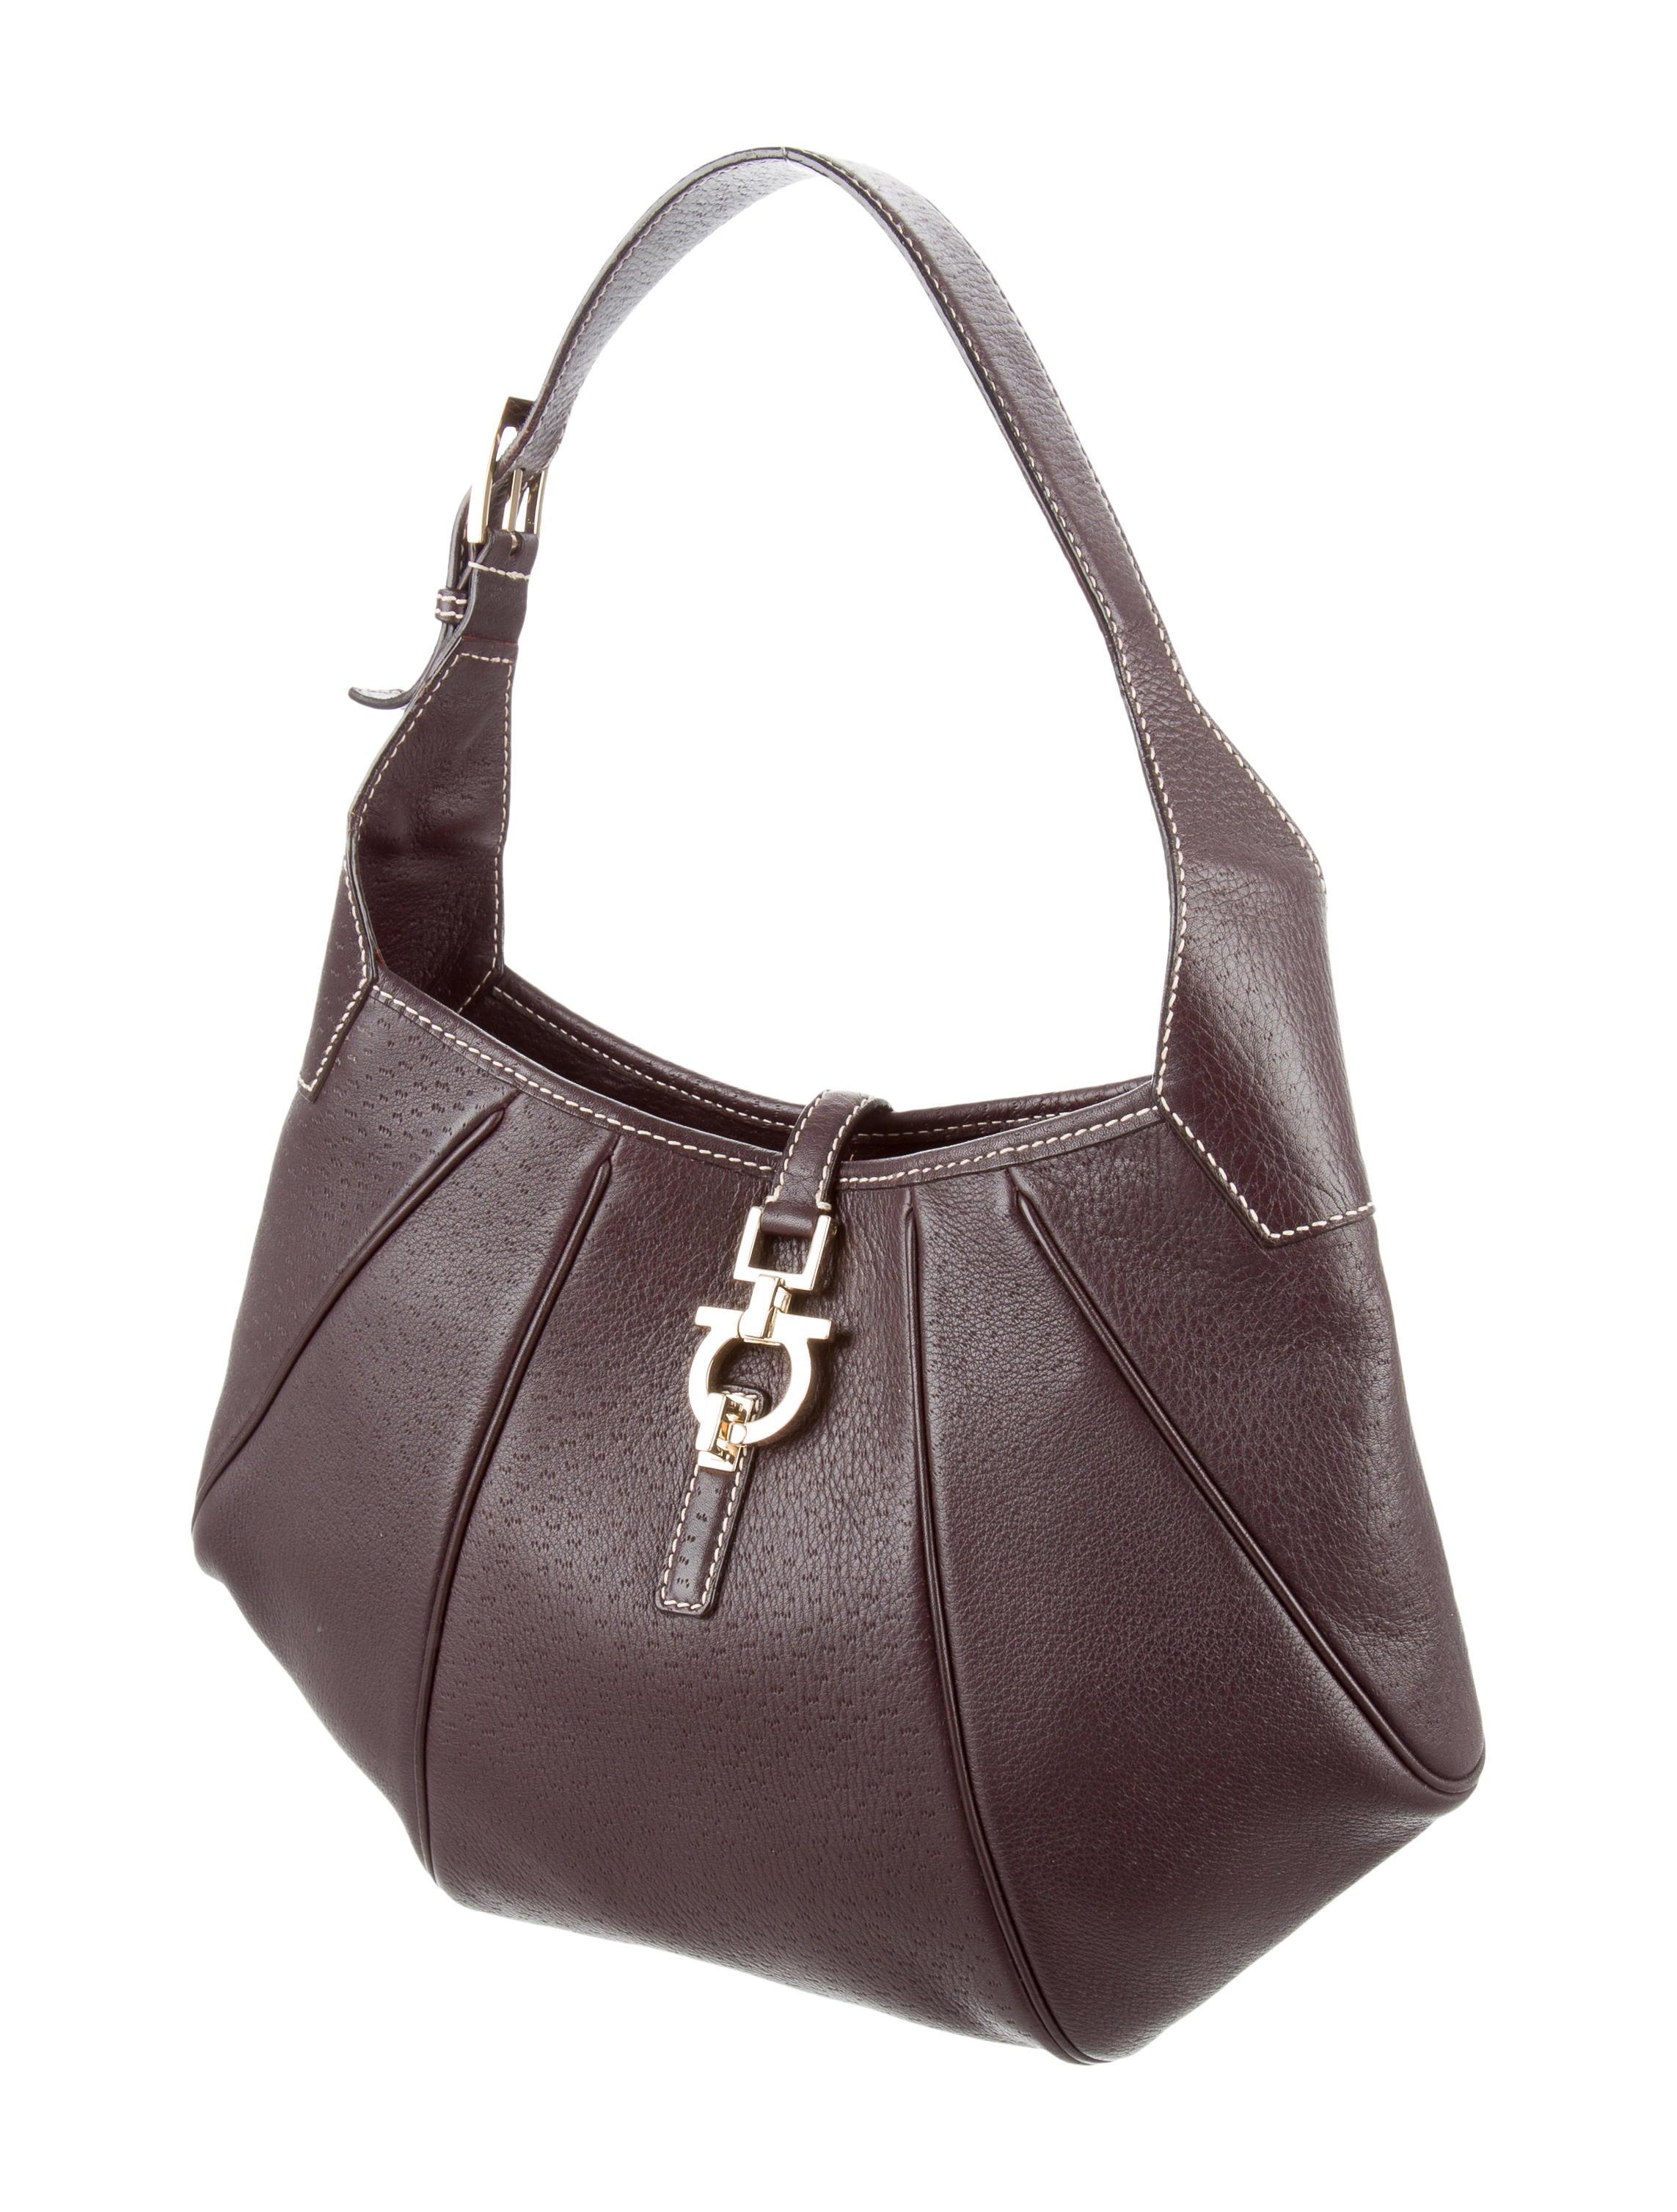 Simple   Shoes Amp Accessories Gt Women39s Handbags Amp Bags Gt Handb